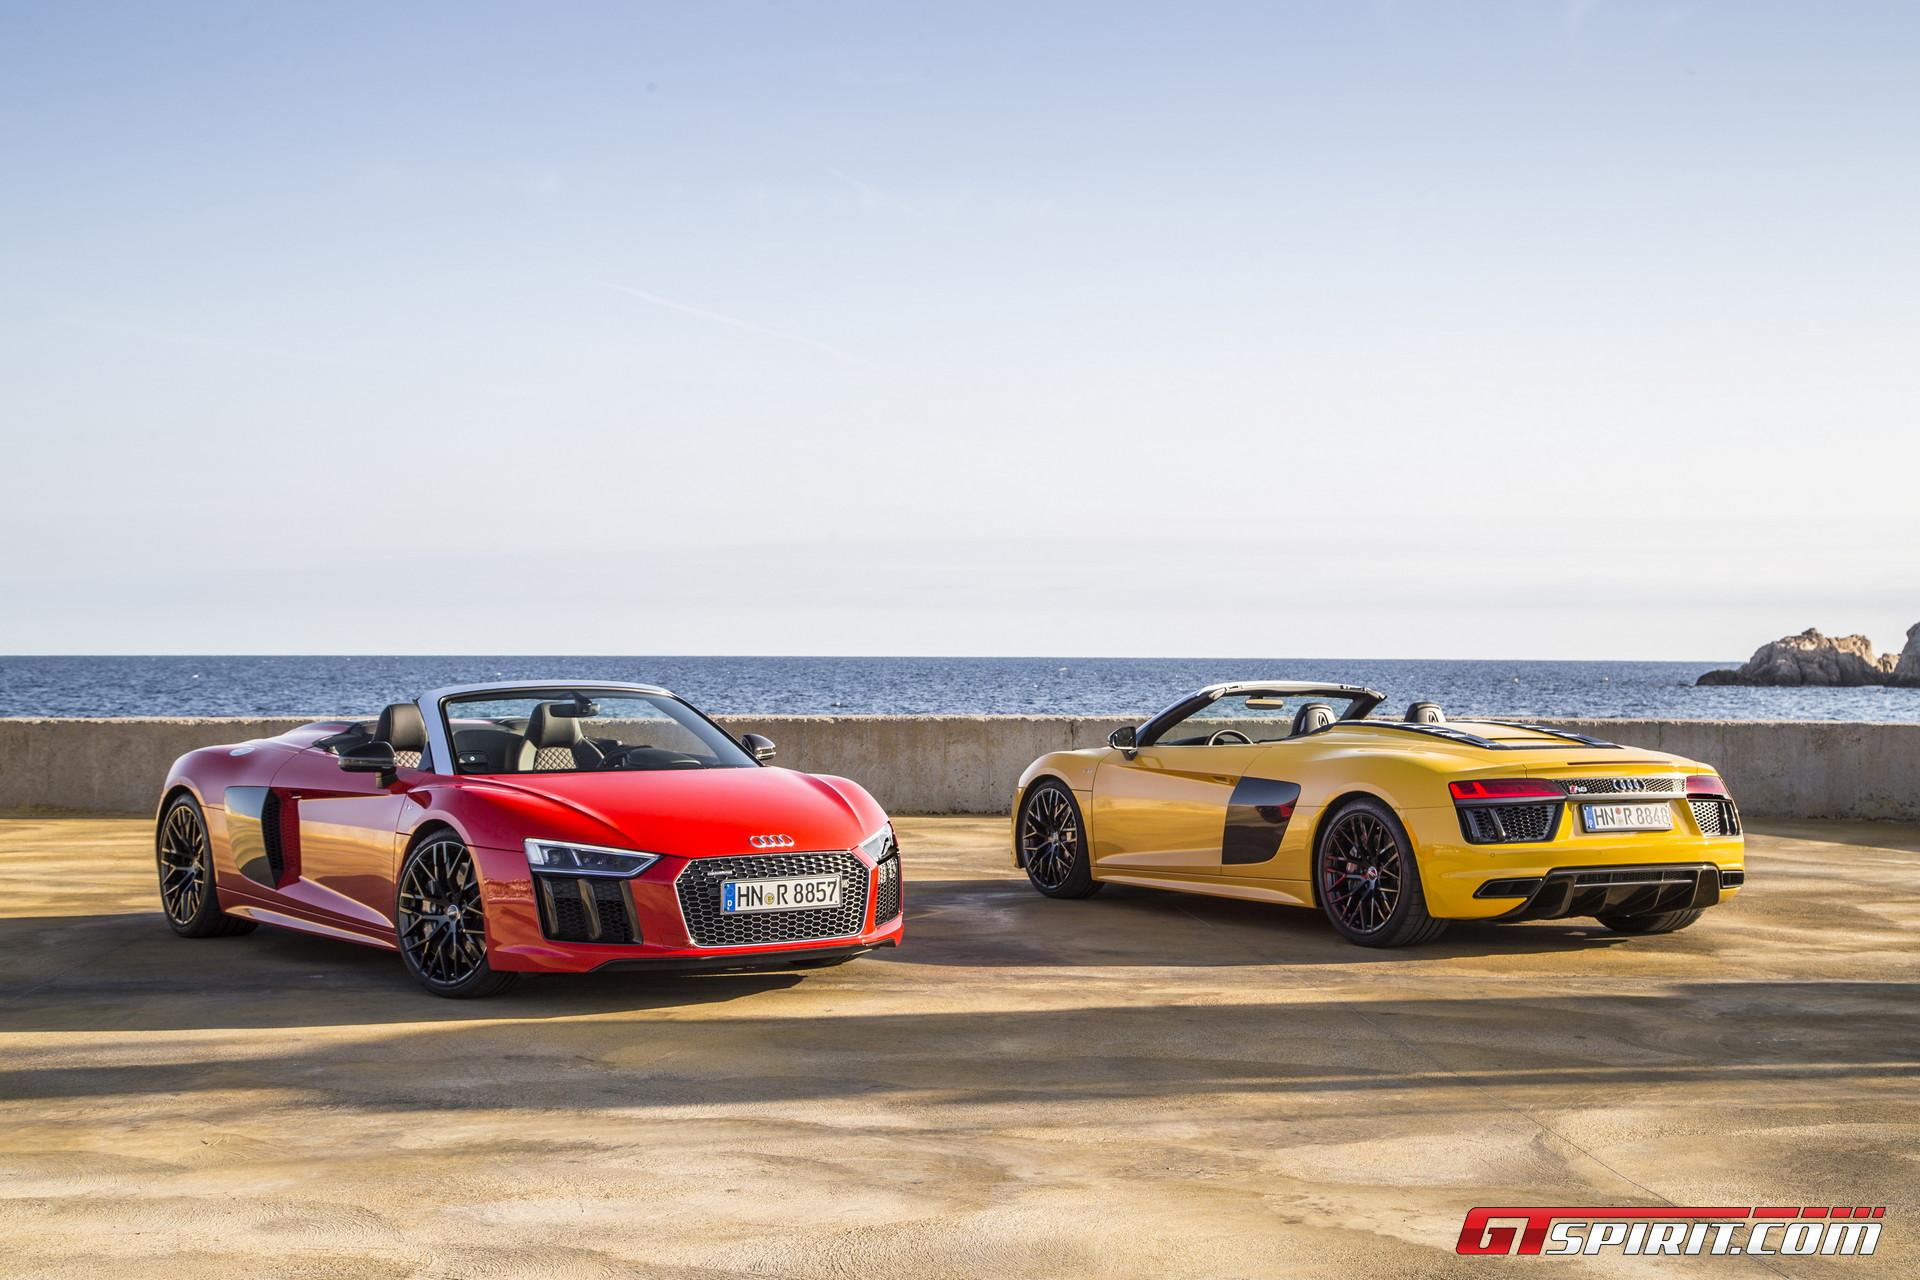 2017 Audi R8 V10 Spyder Review – Car Machine News Audi R Spyder Review on 2016 audi s5, 2016 audi allroad, 2016 audi tt, 2016 audi q7, 2016 maserati spyder, 2016 audi sq5 tdi, 2016 audi a6 avant wagon, 2016 audi a4, 2016 audi rs4, 2016 audi a5, 2016 audi rs5, 2016 audi a8, 2016 audi super car, 2016 audi a7, 2016 audi rs3, 2016 audi s6 avant, 2016 audi s4, 2016 audi s7 sportback, 2016 audi q5 suv, 2016 fiat 500 spyder,